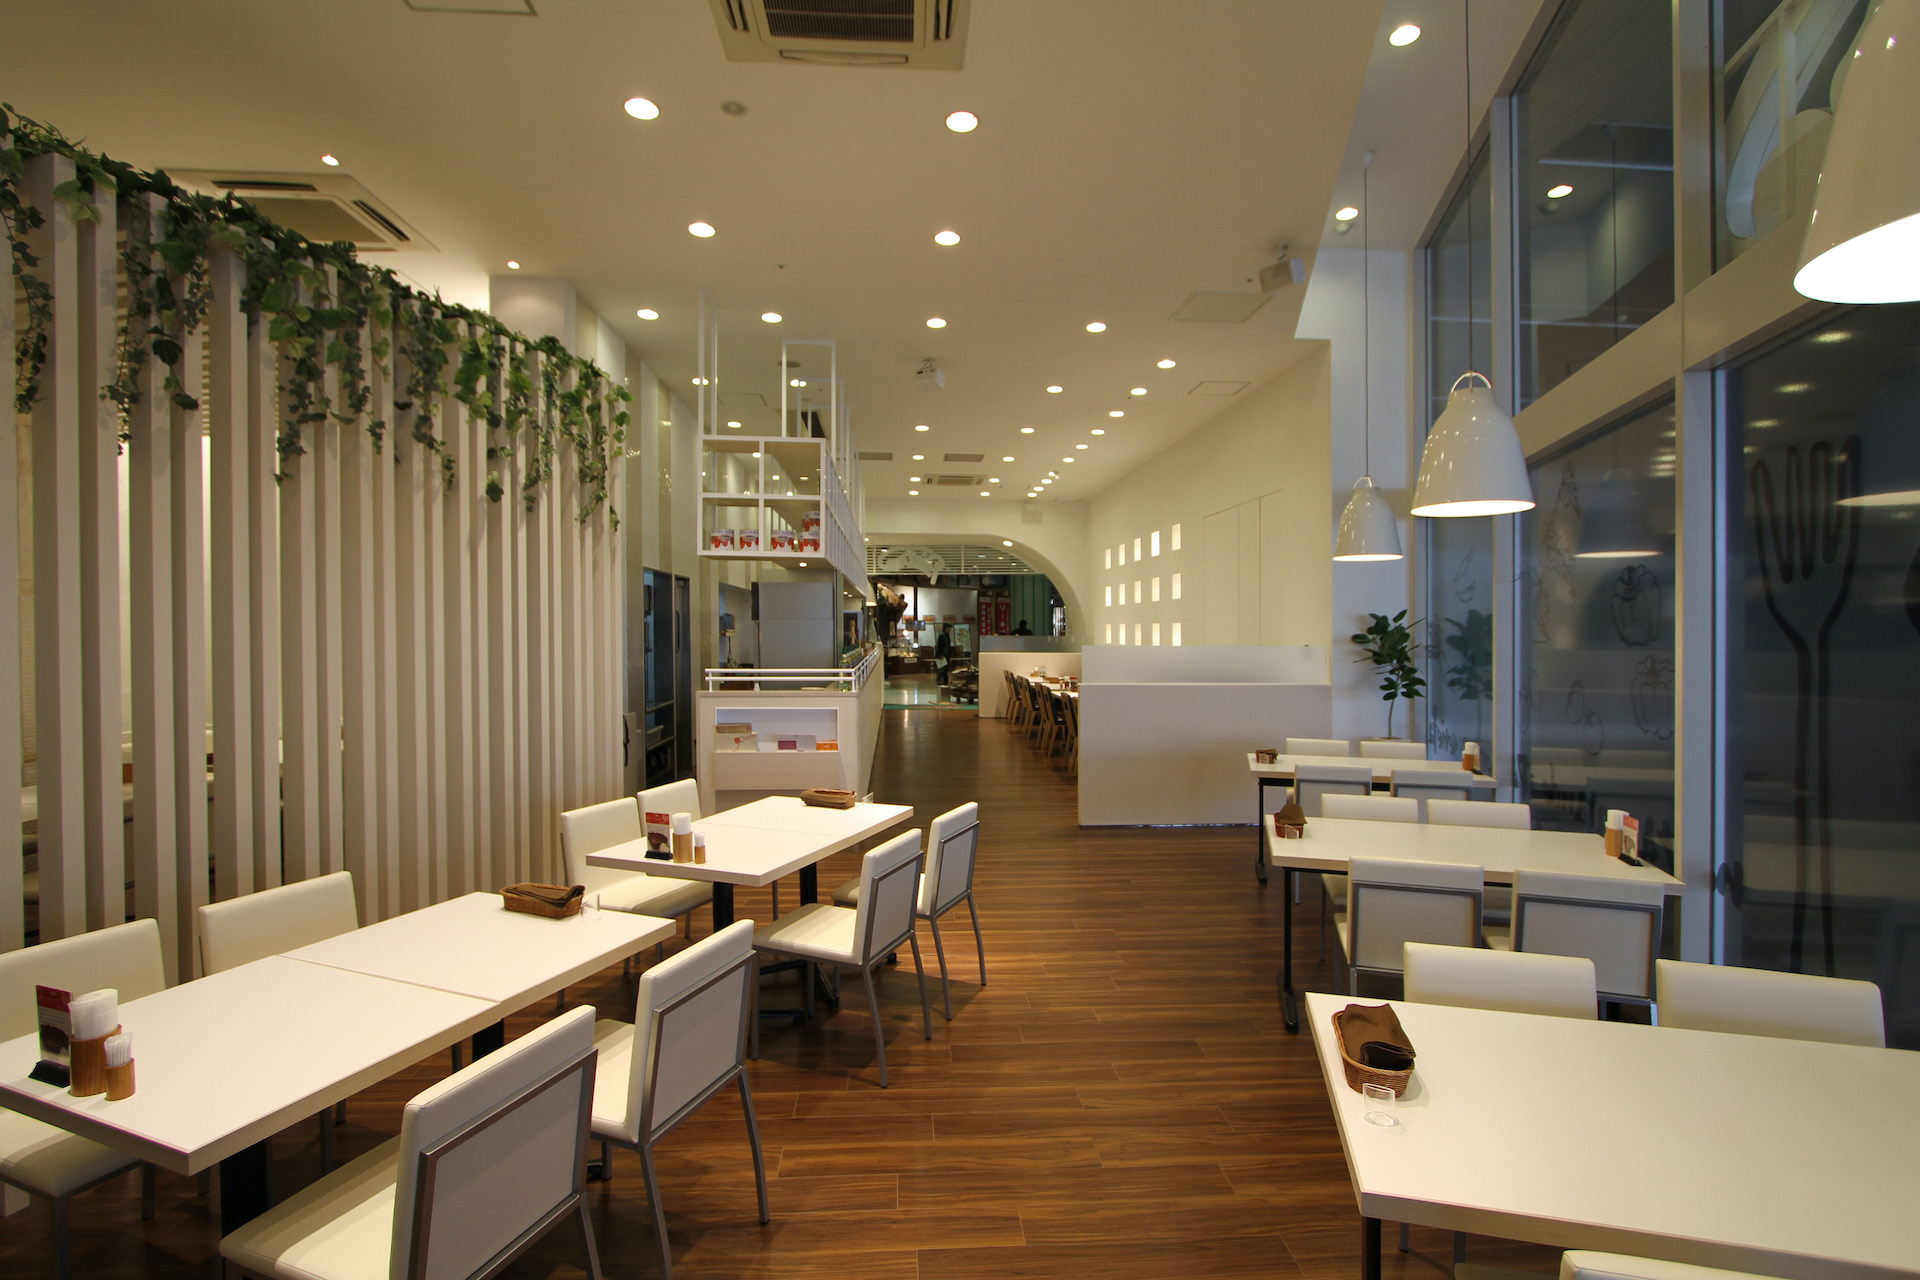 Pietro -Aeonmall Fukuoka-